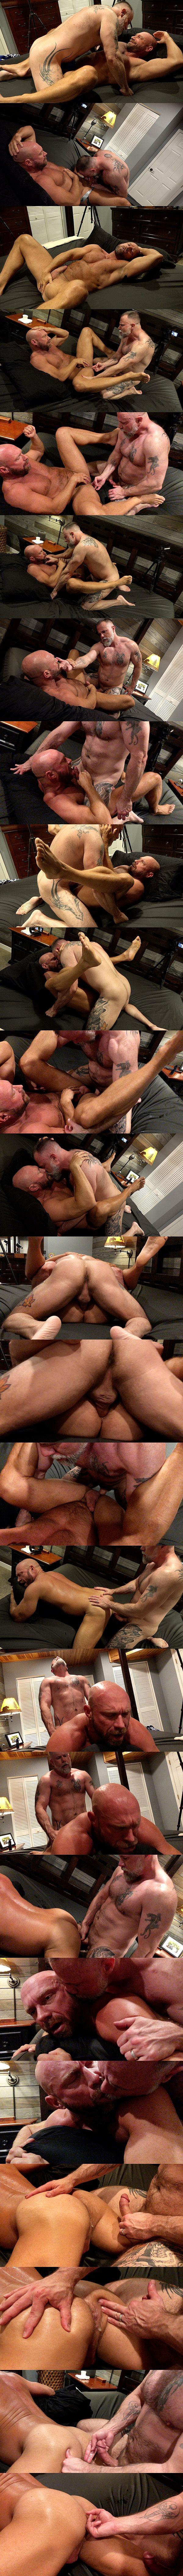 Inked muscle bear Liam Angell barebacks masculine bald daddy Killian Knox before he creampies Killian in Feeding Daddy Some Boy Load at Musclebearporn 01